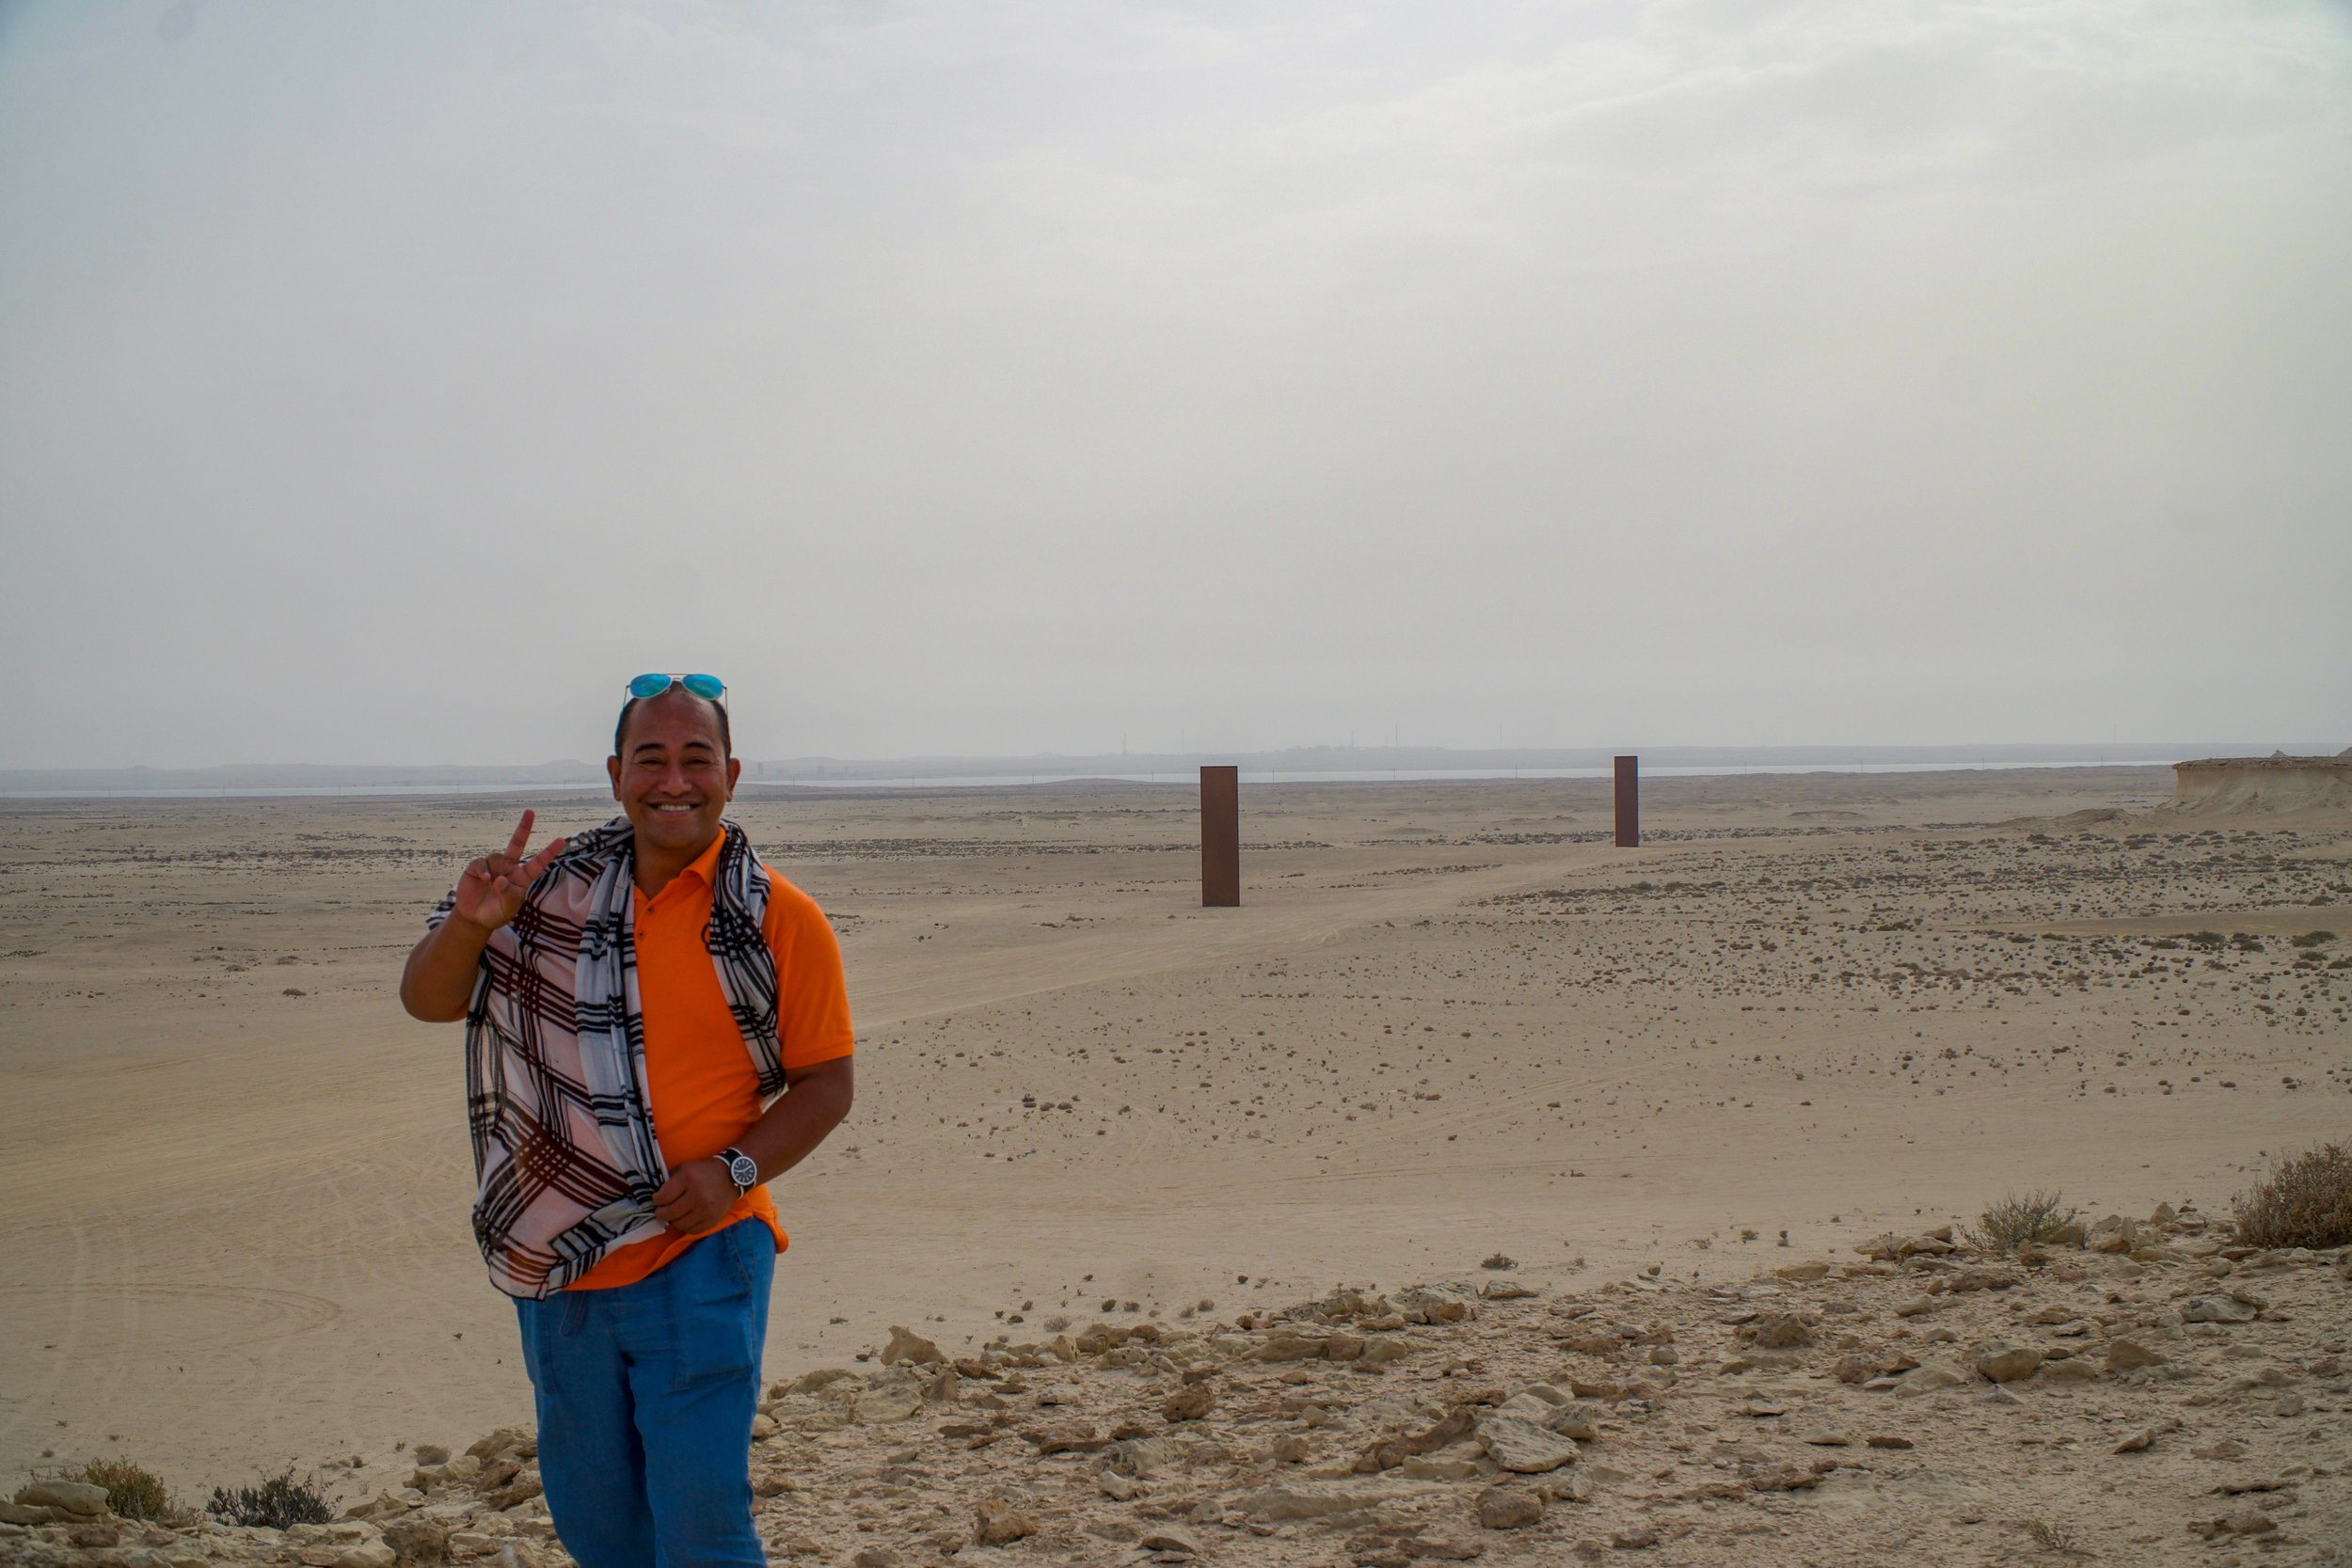 J.Lo the Tour Guide, Conquering Fears. East West West East, Zekreet, Qatar.